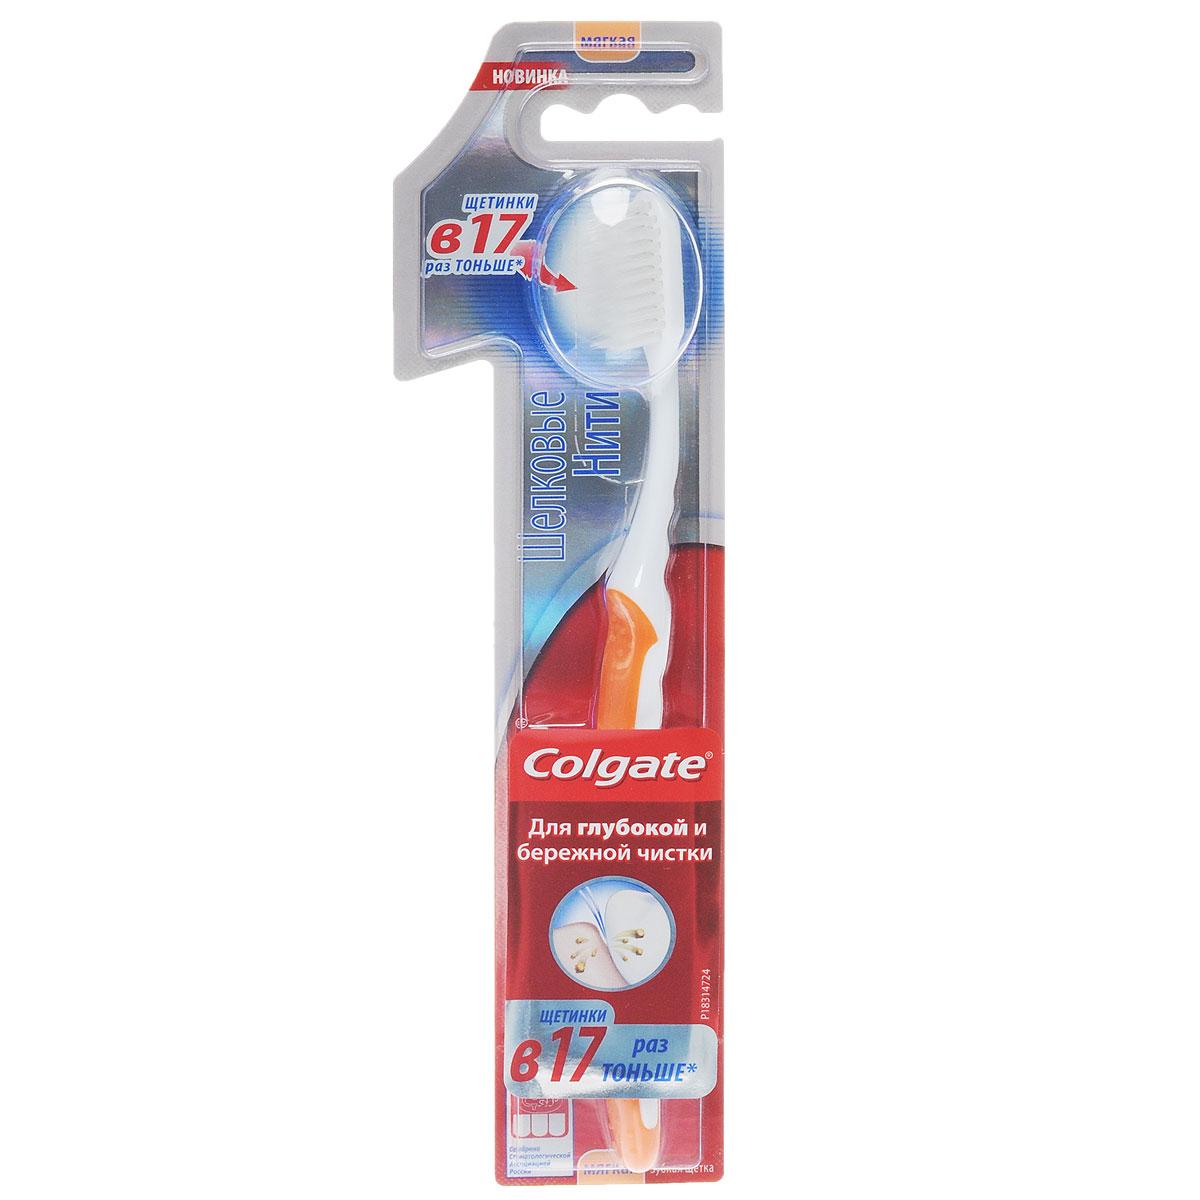 Colgate Зубная щетка